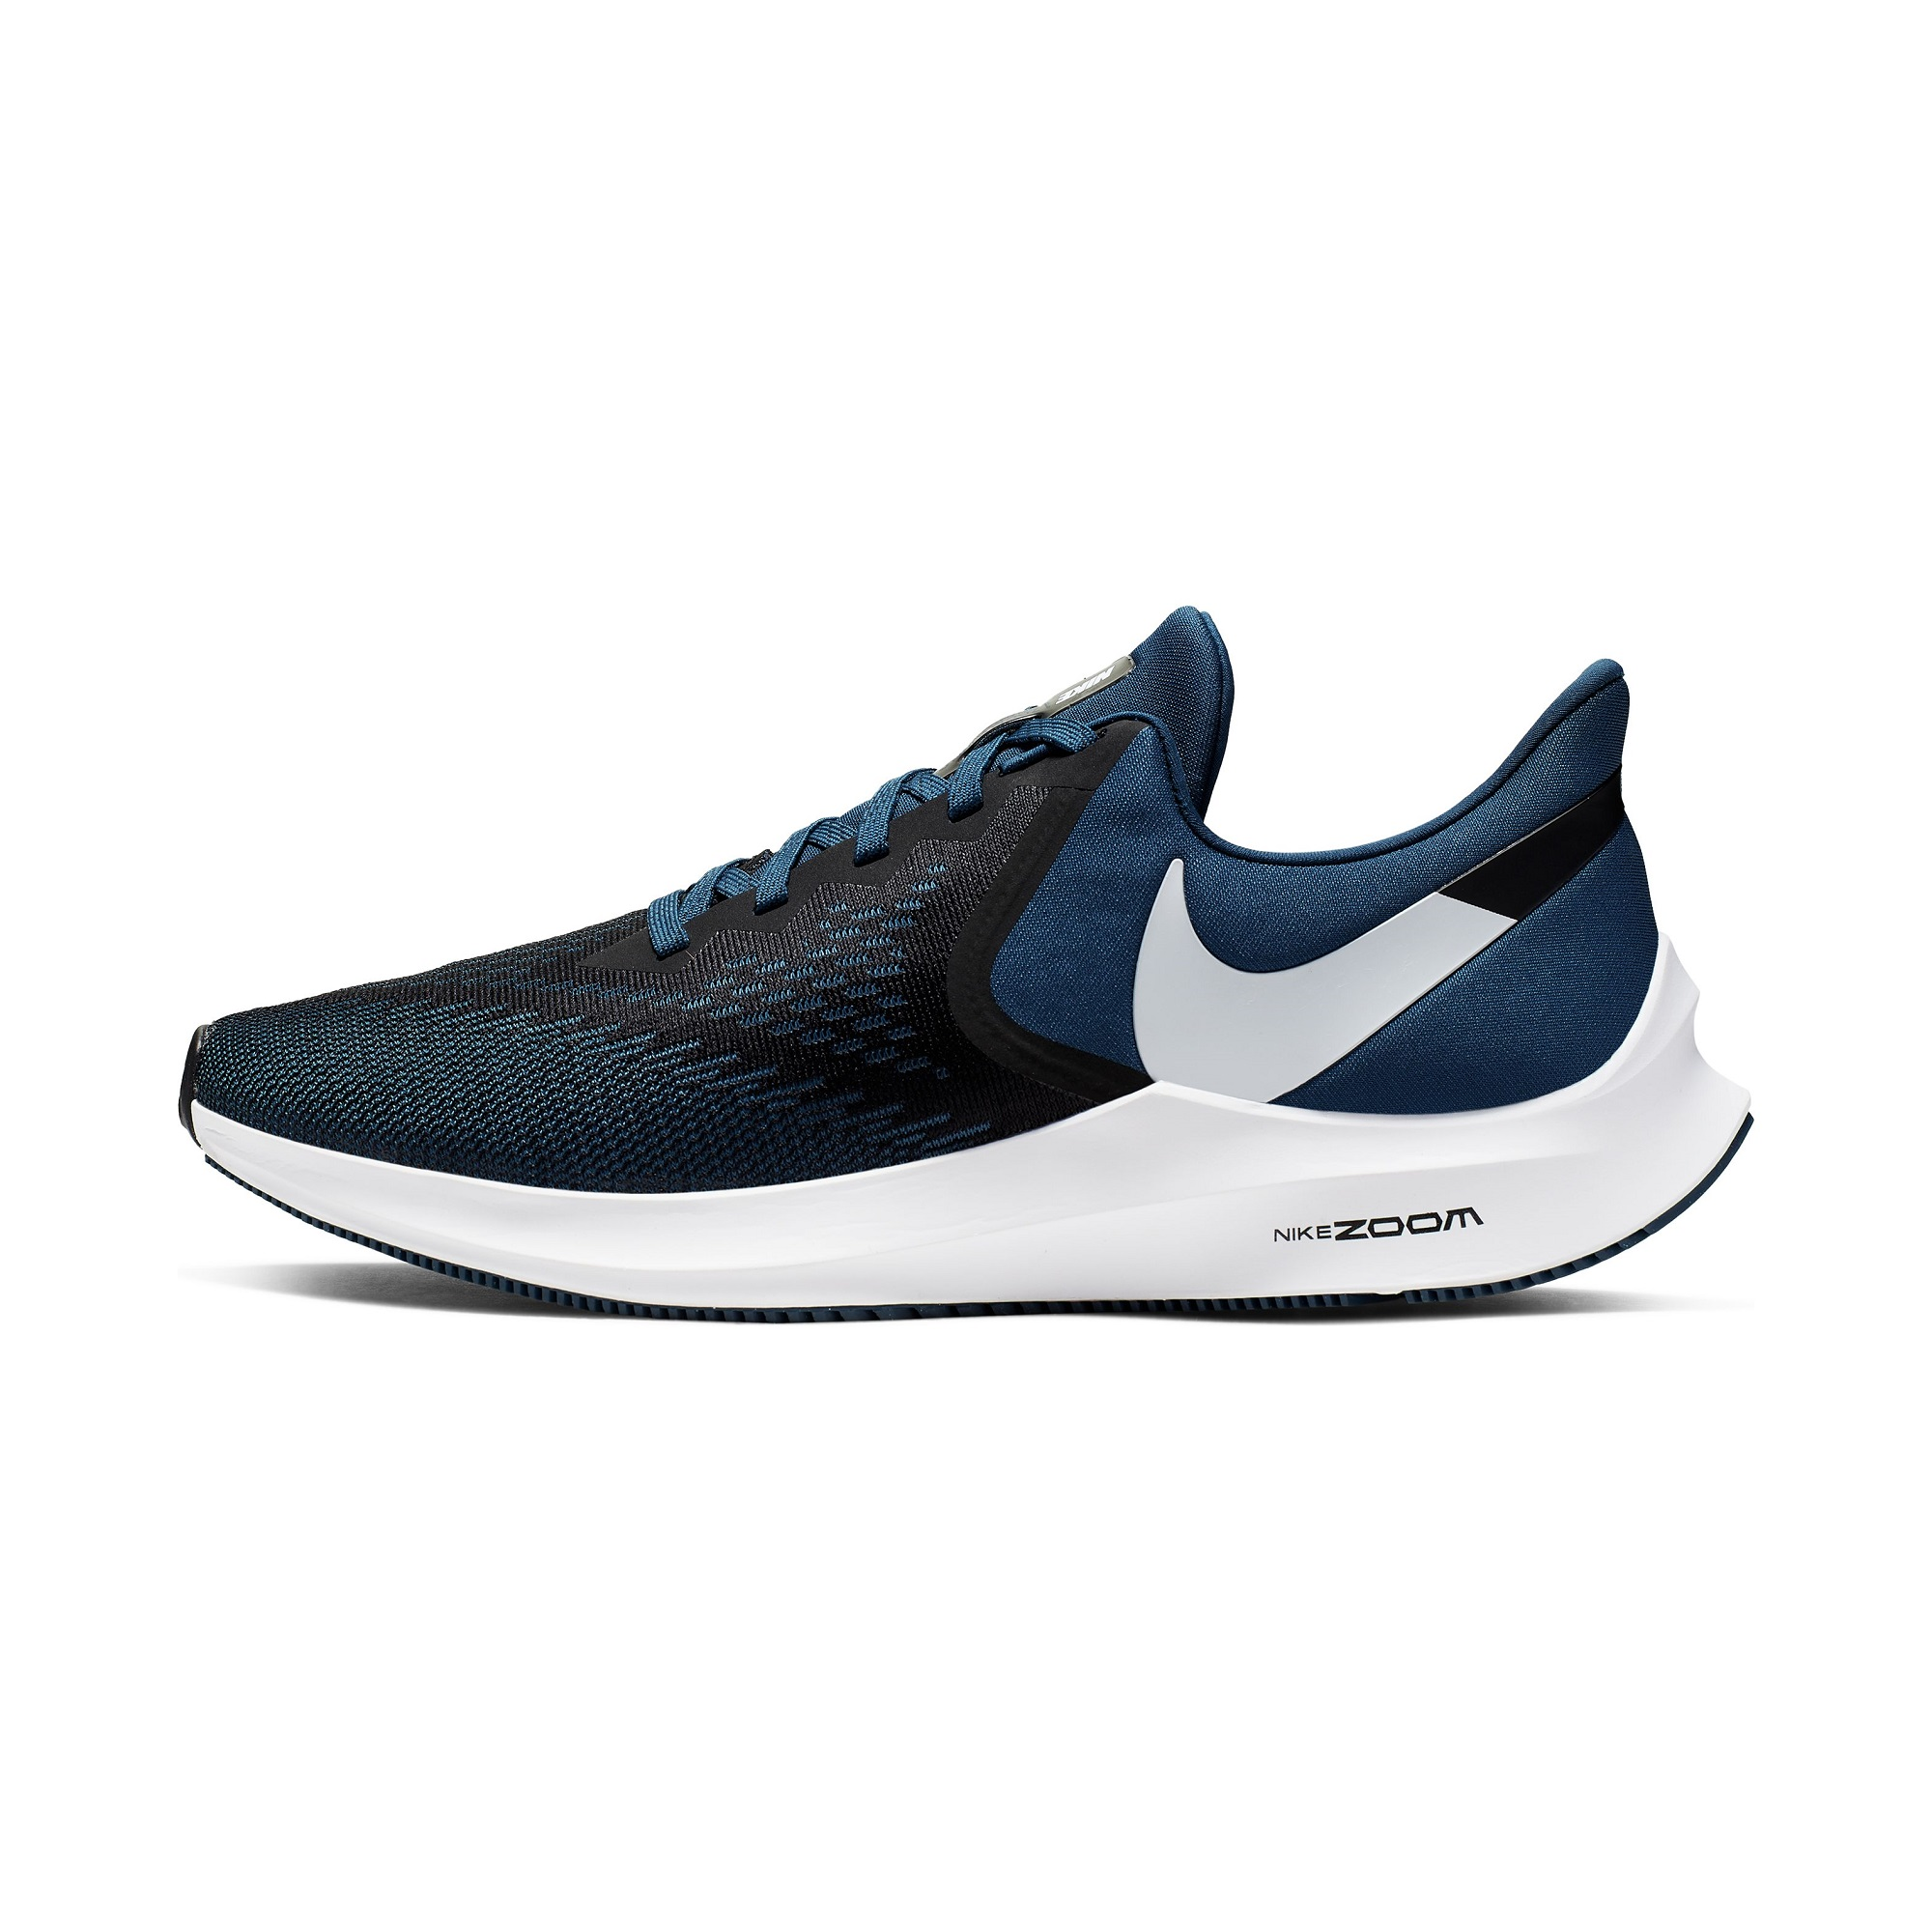 Nike Кроссовки мужские Nike Zoom Winflo 6, размер 45 цена